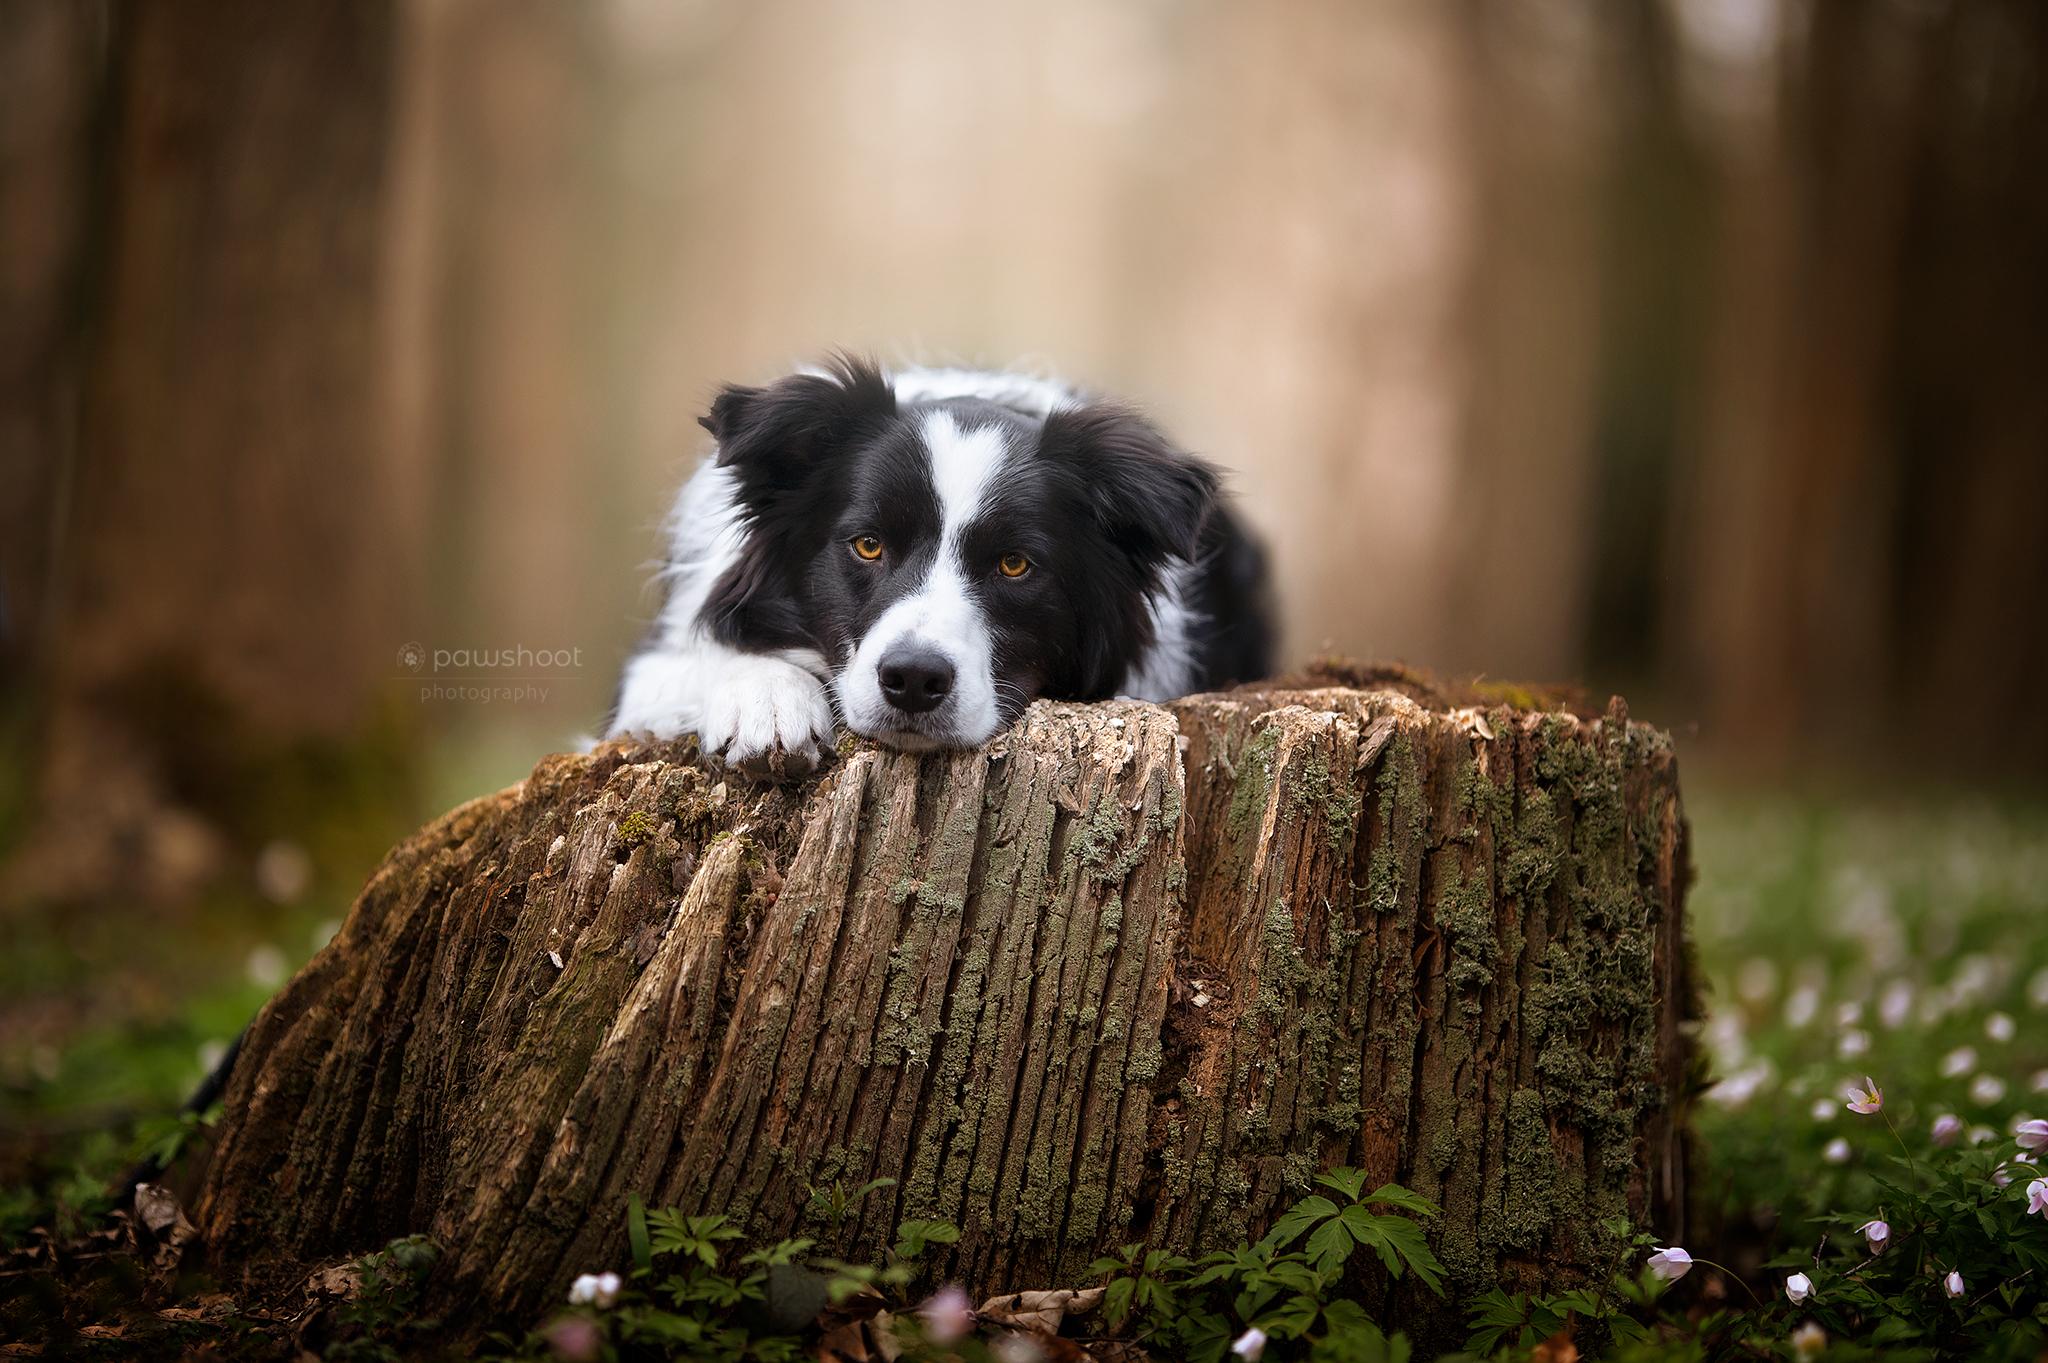 hond poseren border collie Pawshoot hondenfotografie